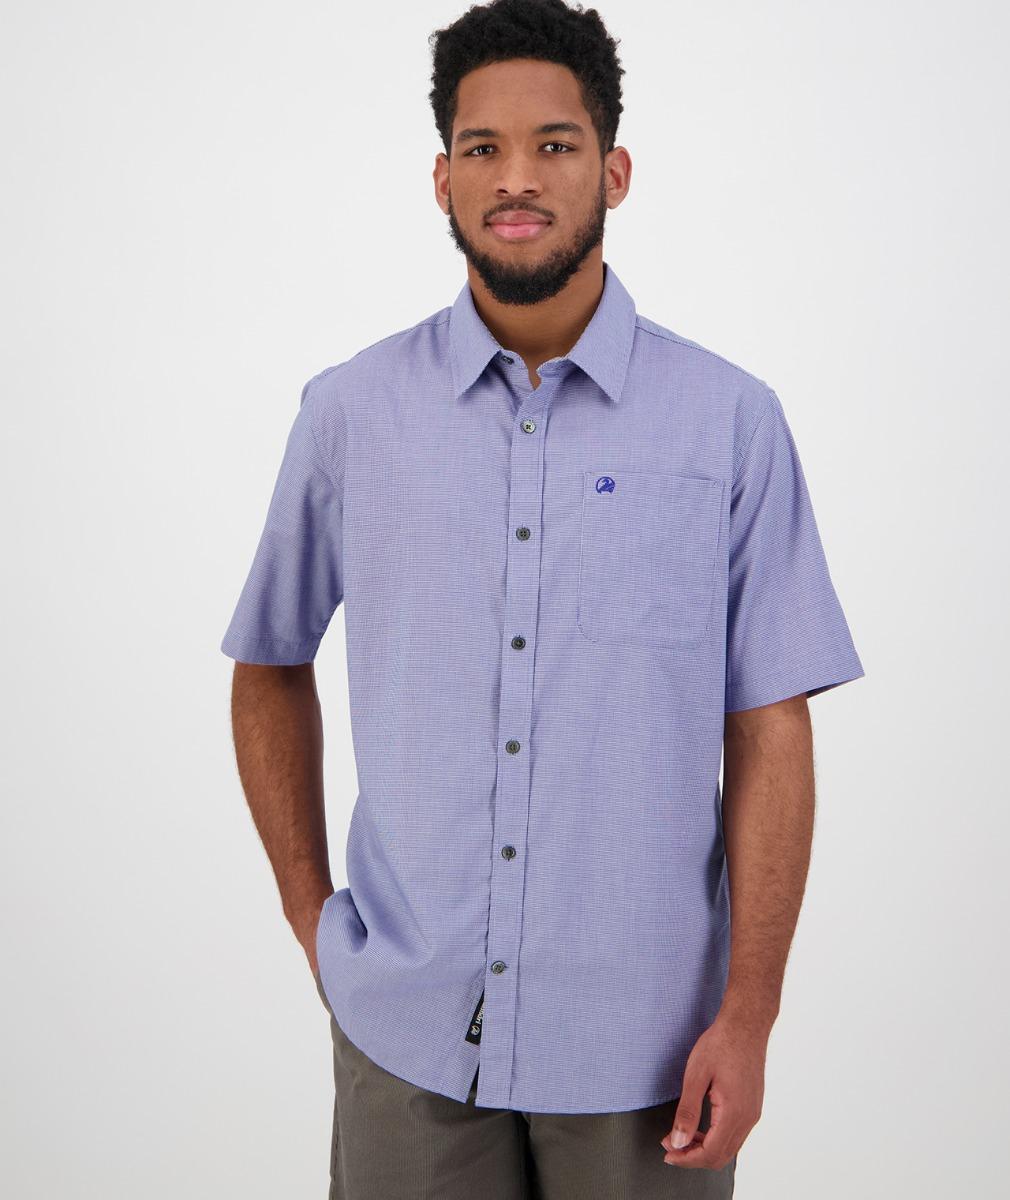 Swanndri Men's Claremont Short Sleeve Shirt in Blue